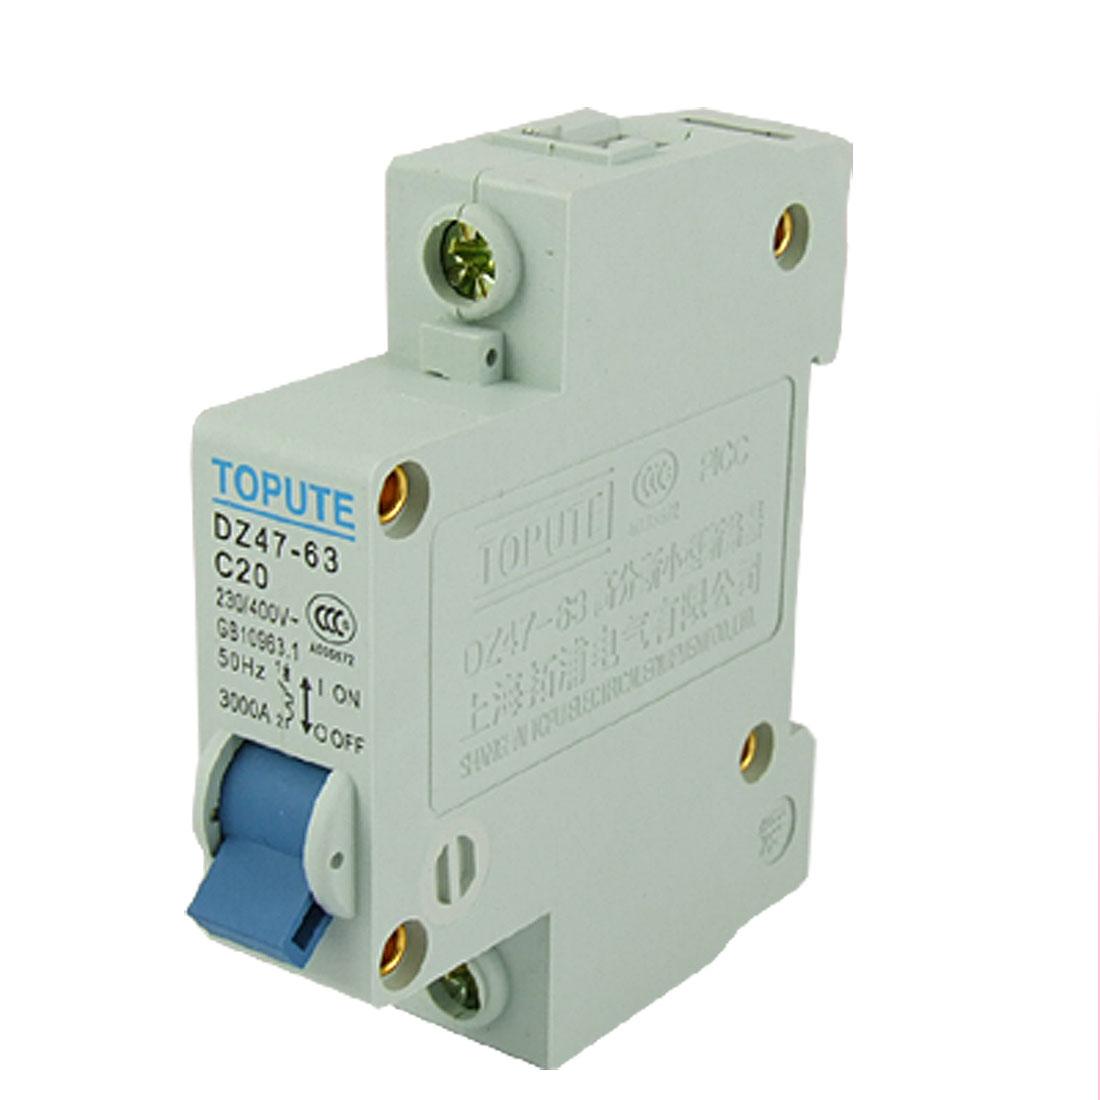 Single Pole Mini Circuit Breaker Auxiliary DZ47-63 C20